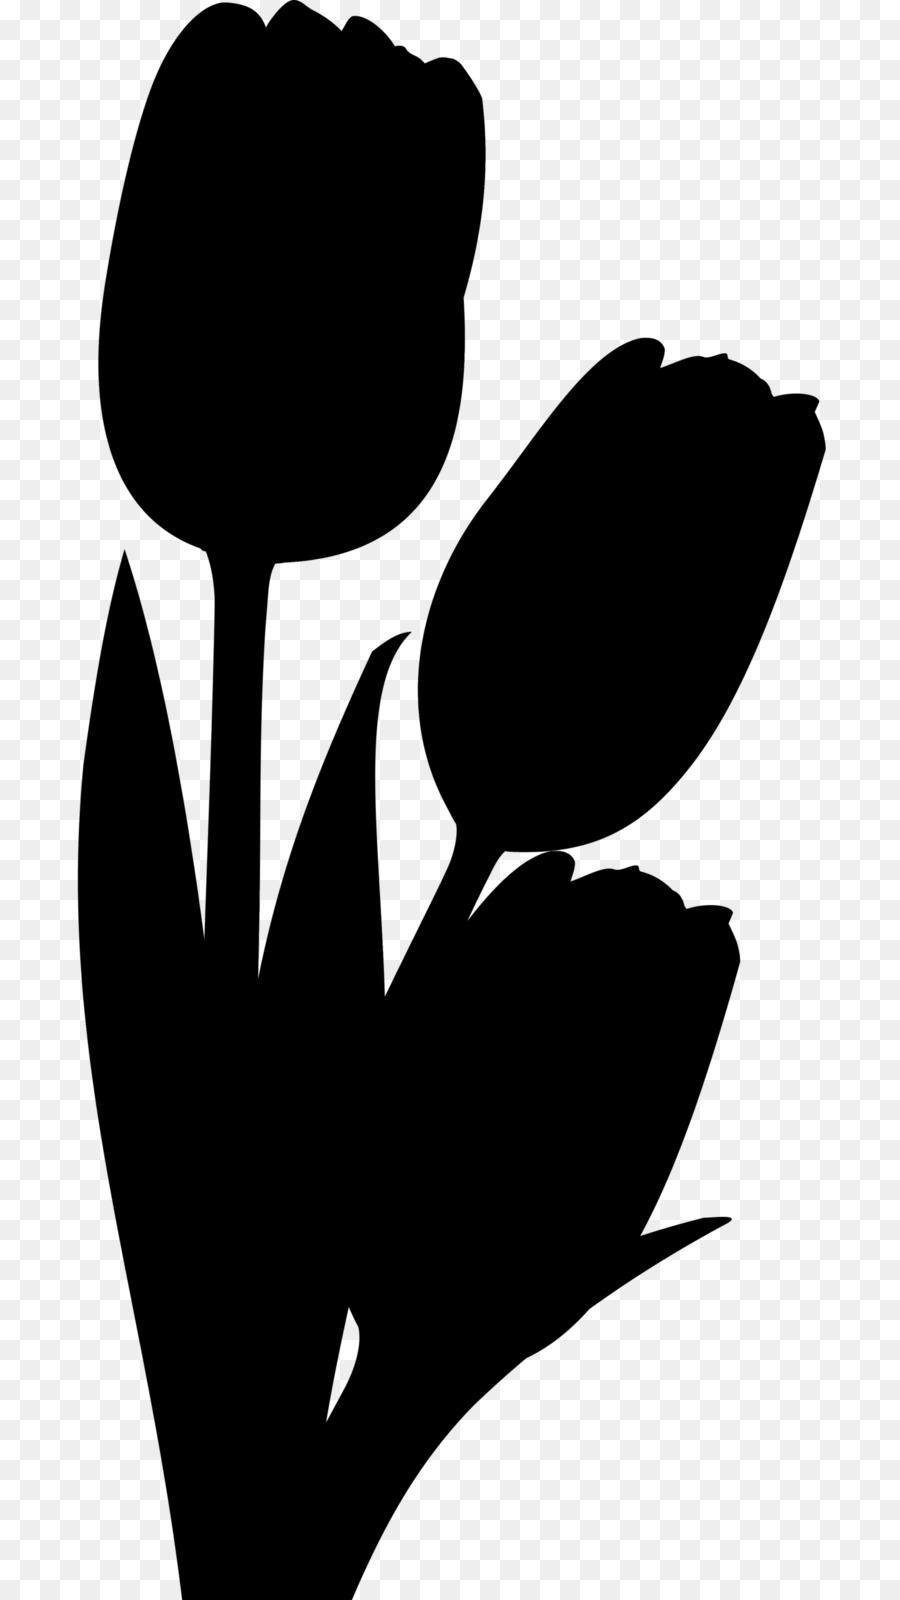 Clam chowder Clip art Silhouette Black.